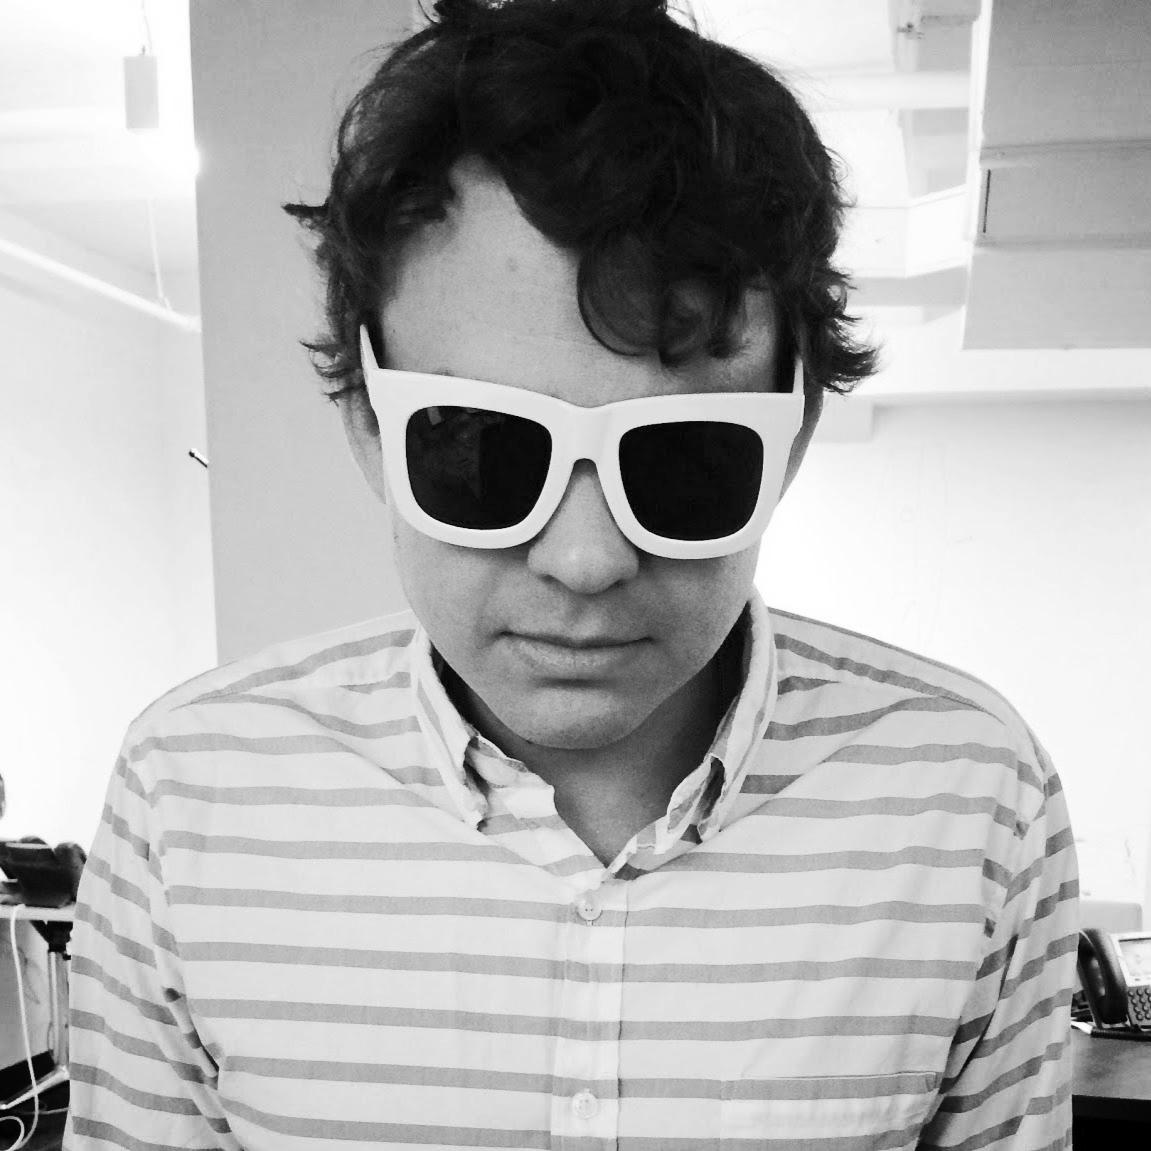 Producer Jean-Paul Tremblay